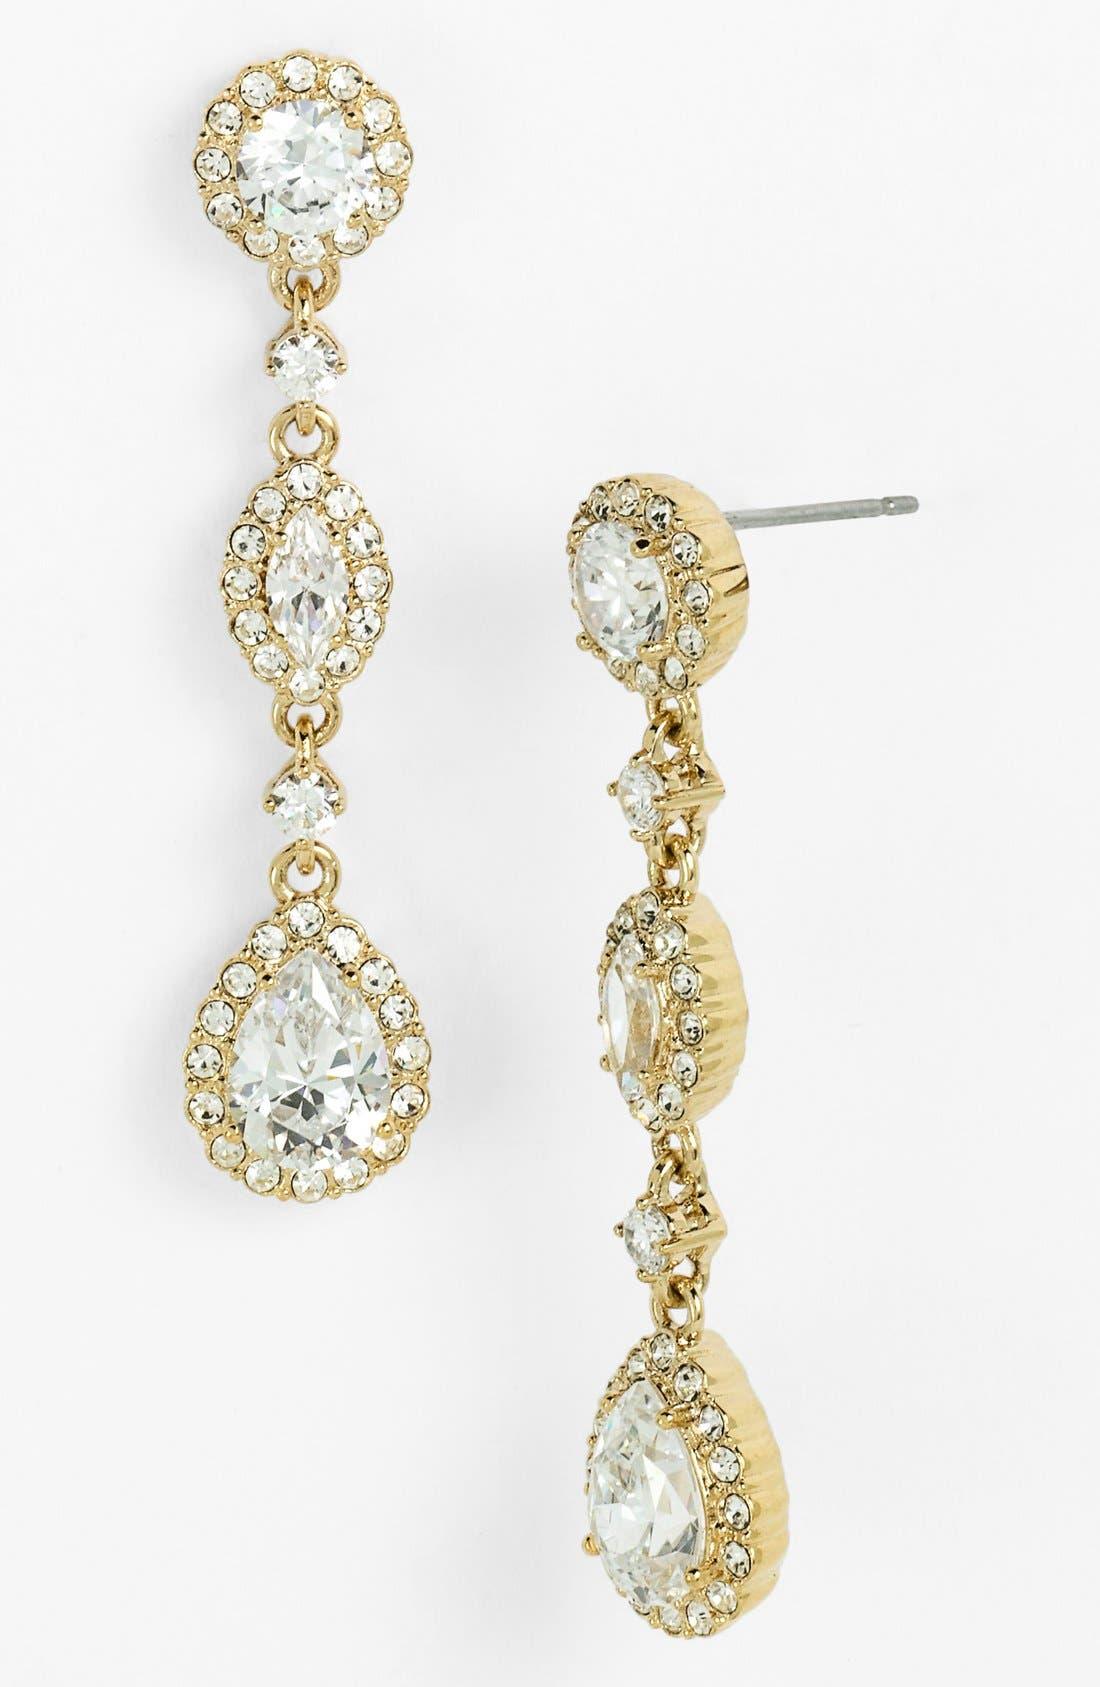 Main Image - Nadri Framed Cubic Zirconia & Crystal Drop Earrings